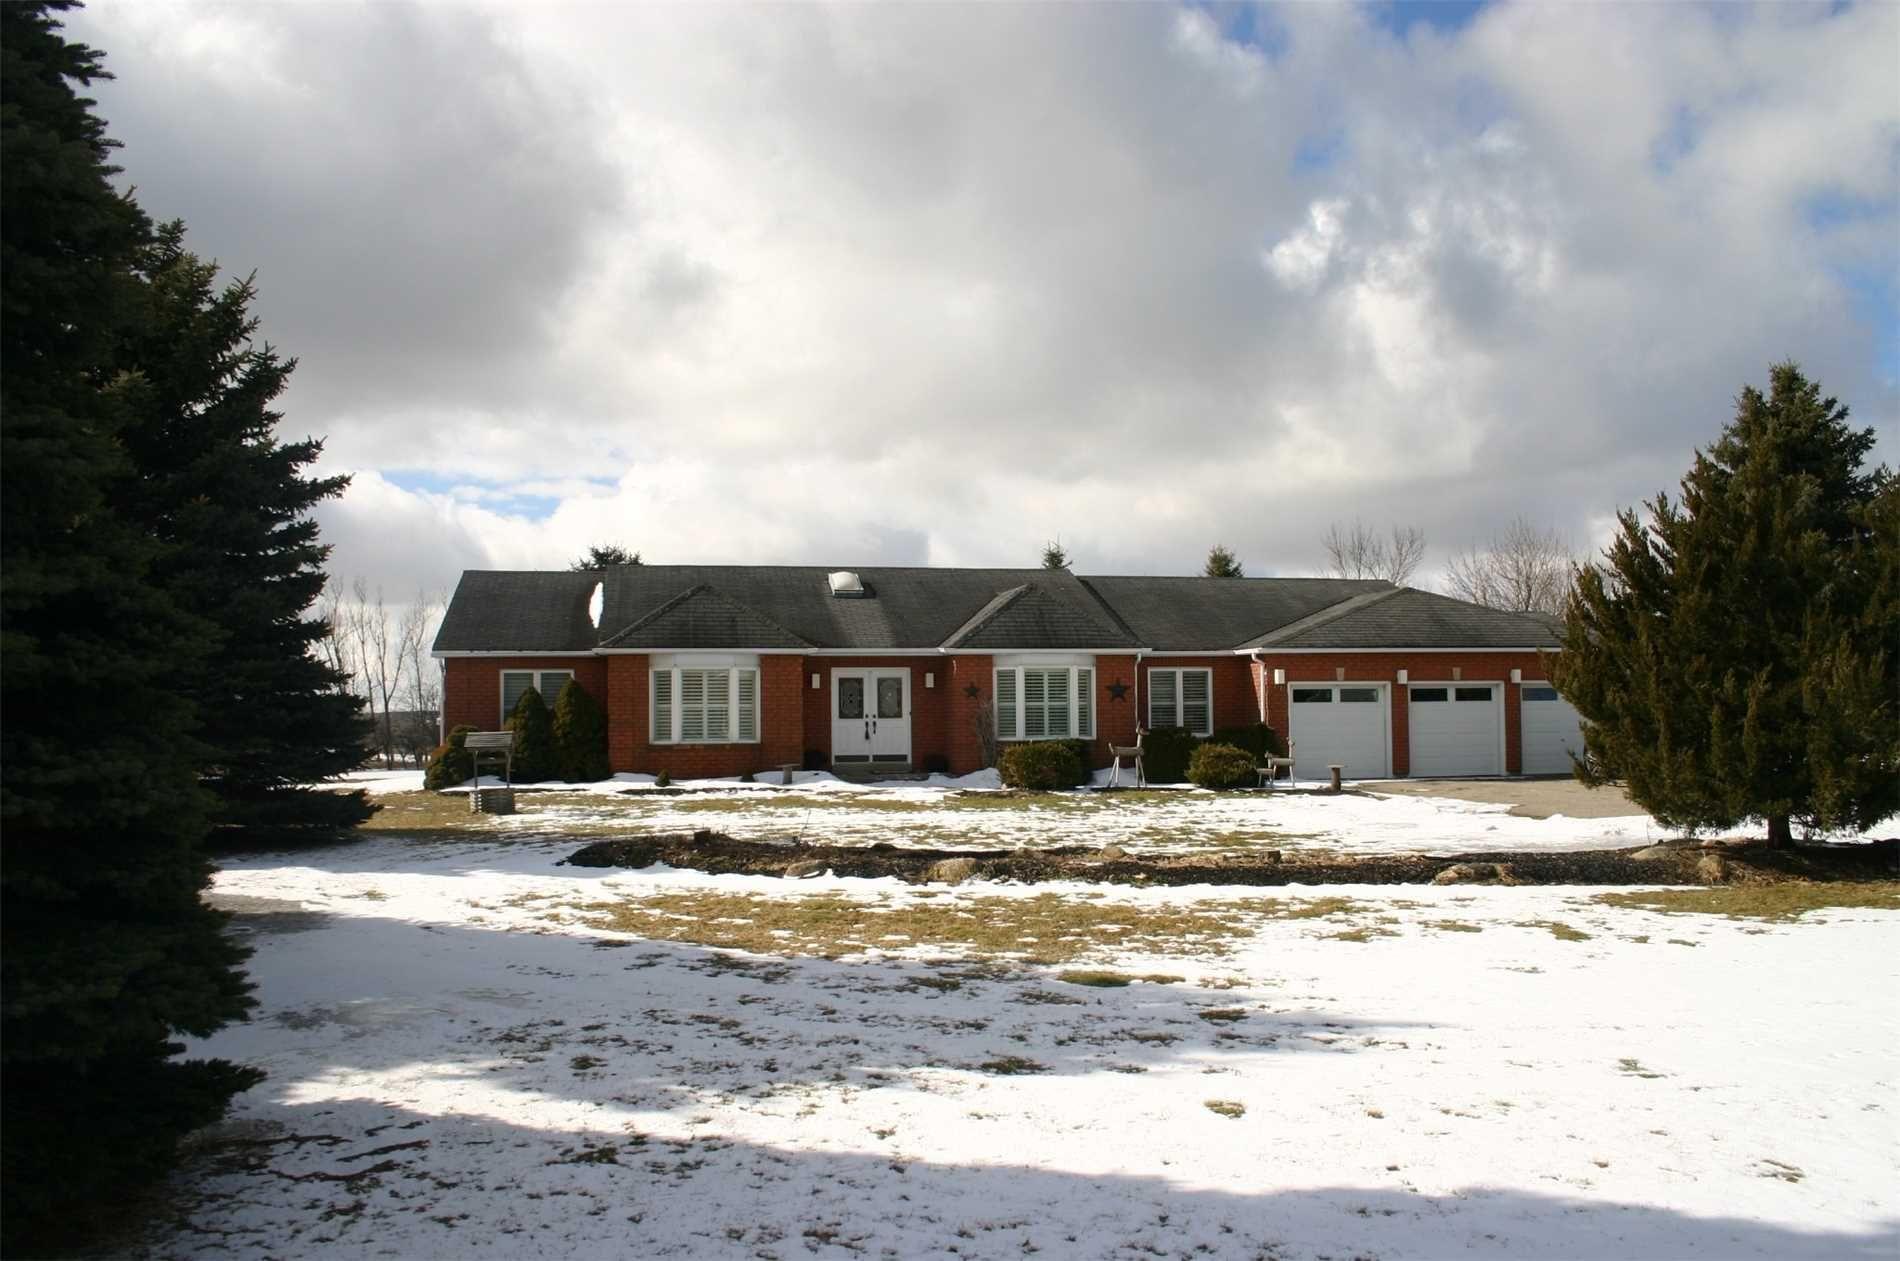 Main Photo: 19 Kingsland Avenue in Mulmur: Rural Mulmur House (Bungalow) for sale : MLS®# X4376322